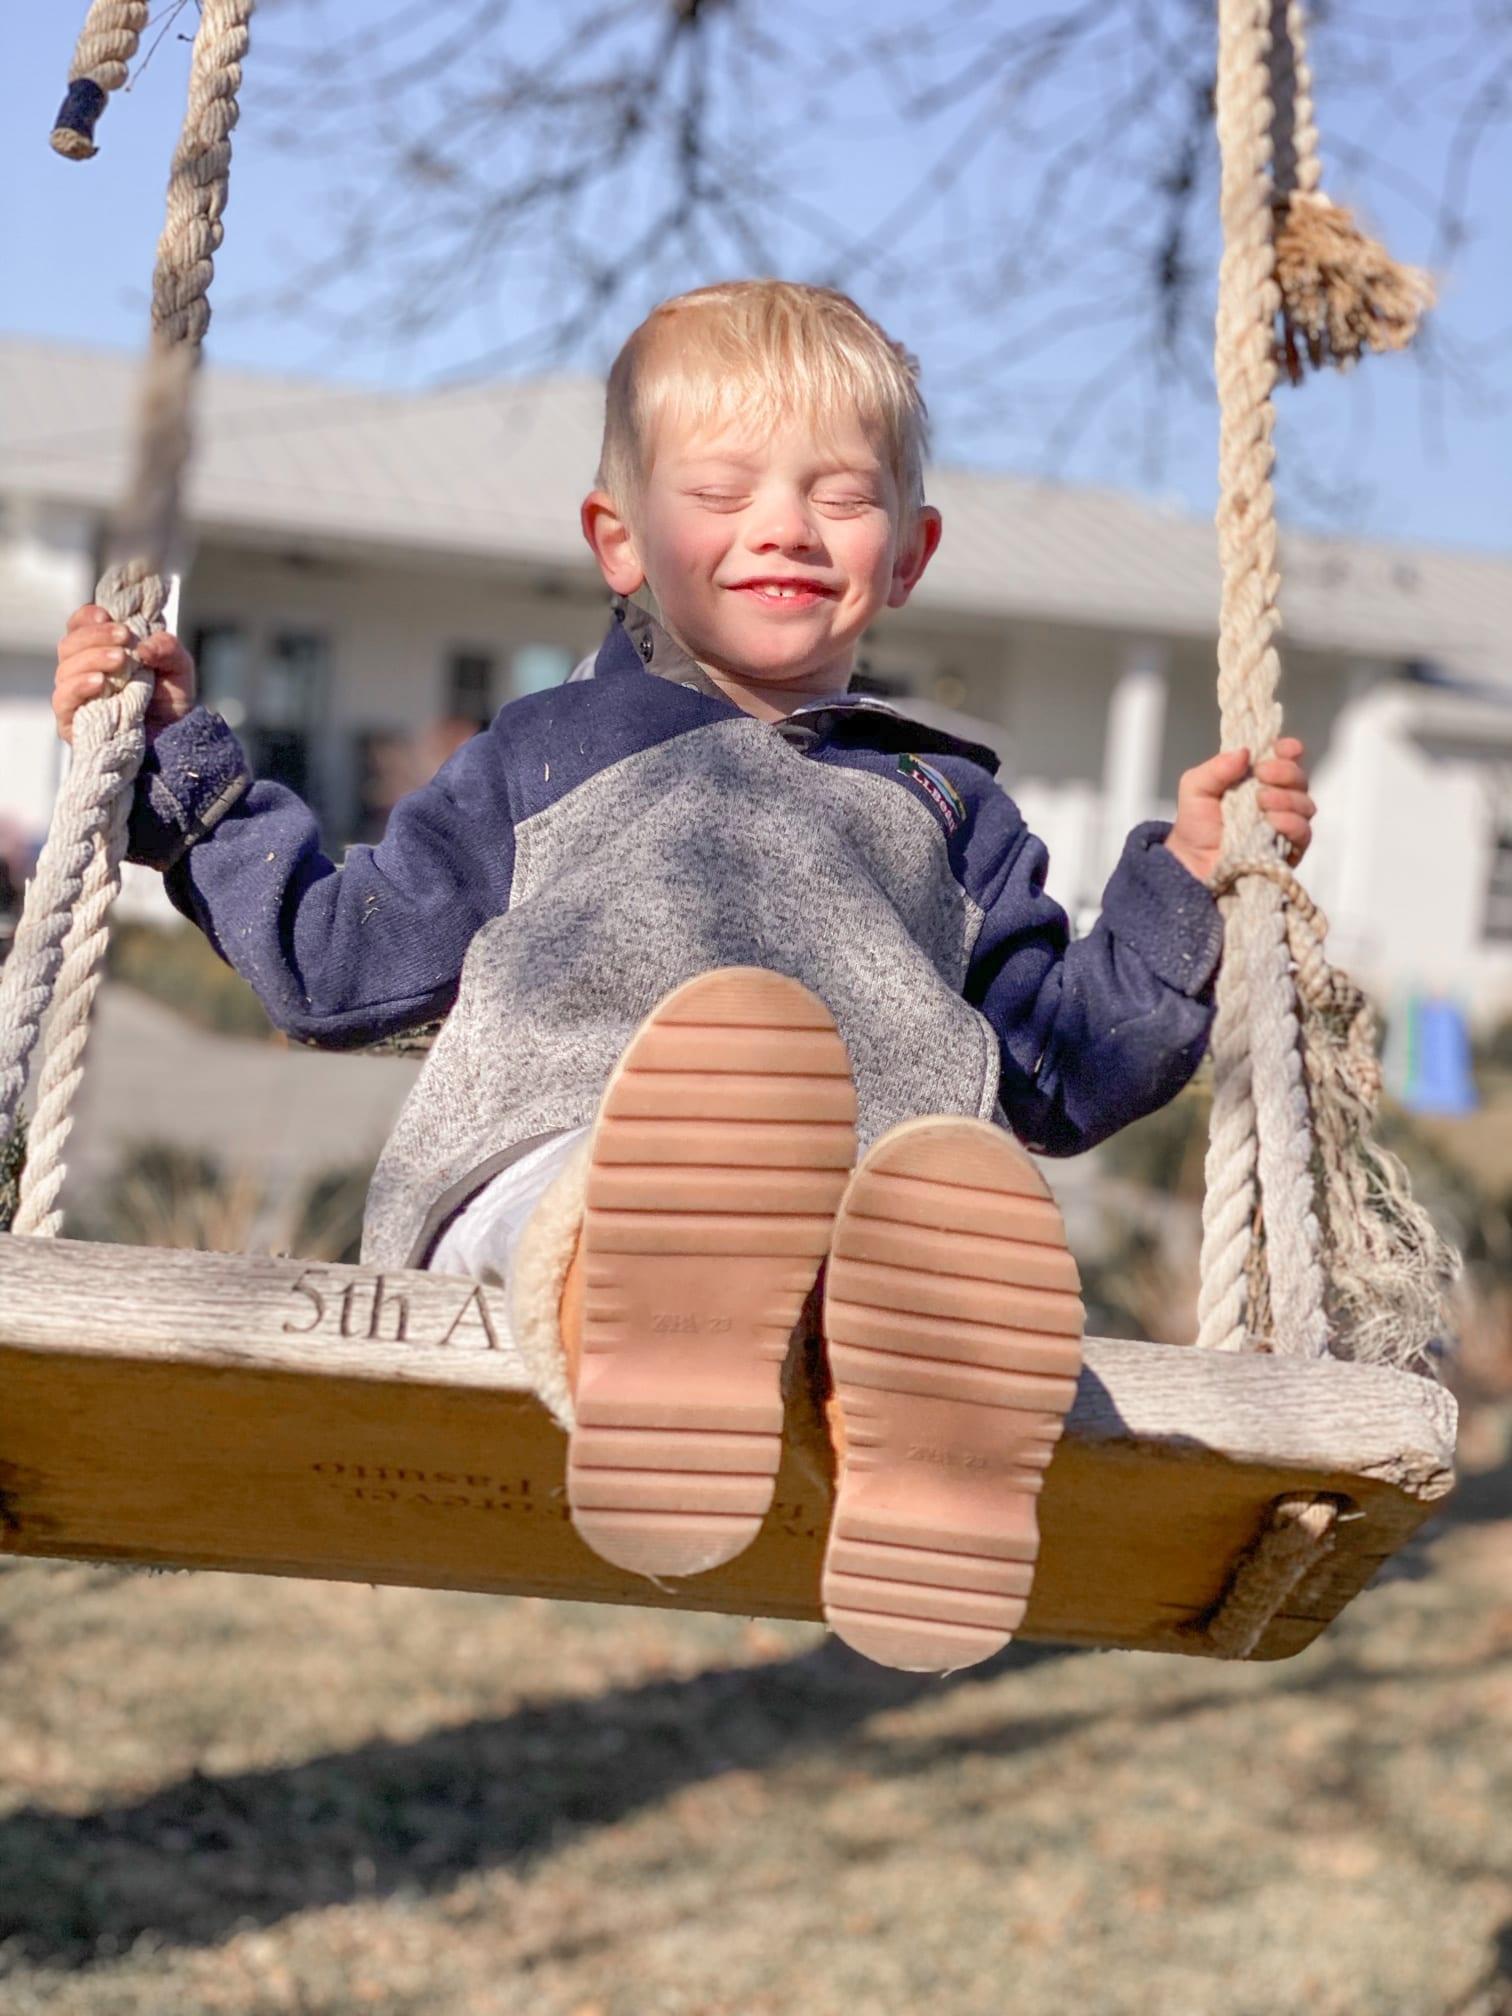 Jillian Harris' Son Swinging